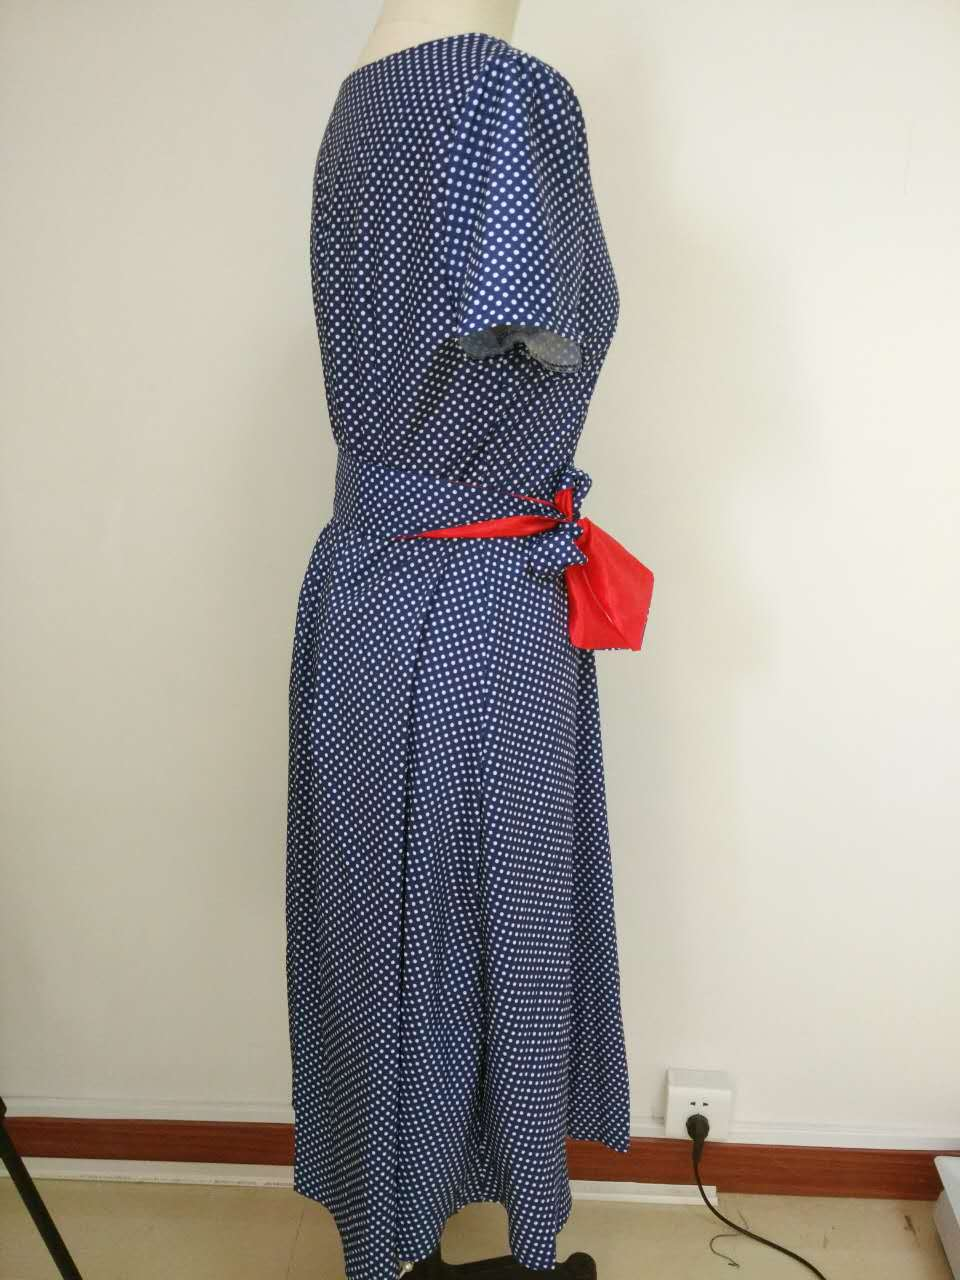 2018 Summer Dress Polka Dot Vintage Dress Short Sleeve Sexy Women Midi Dress Casual Party Dresses  Plus Size GV173 4